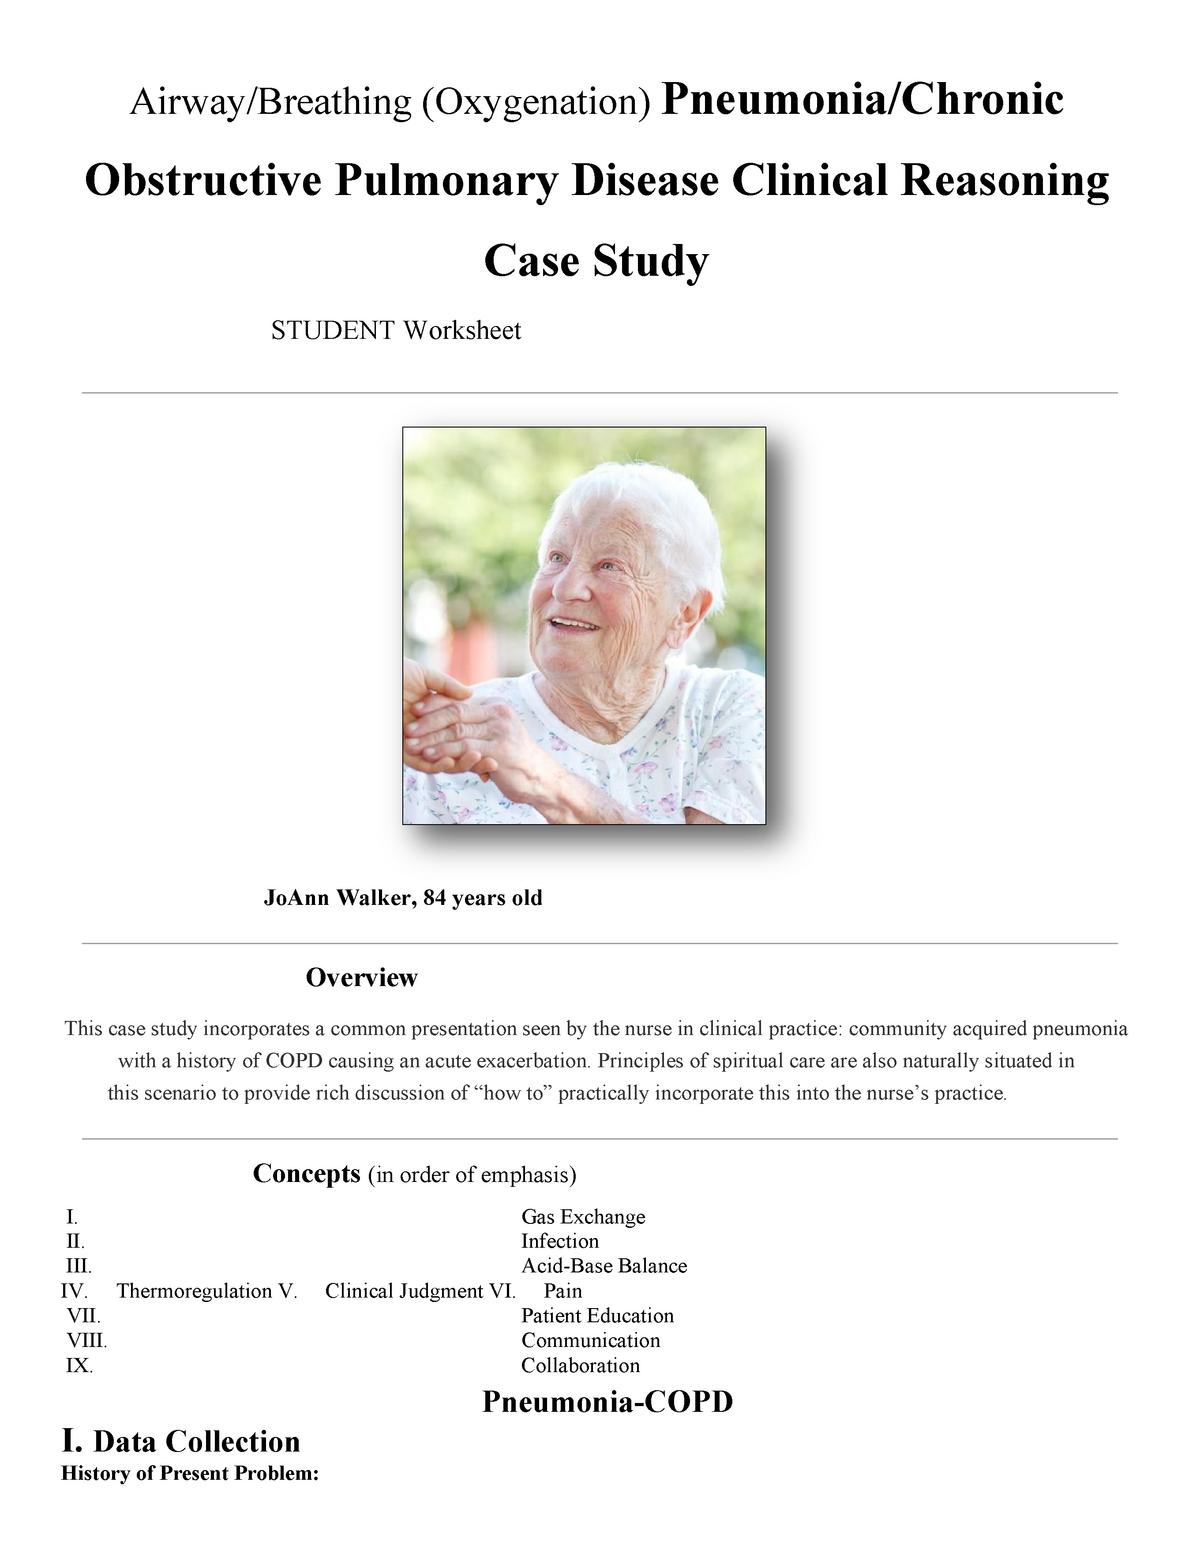 Pneumonia Copd Case Study Solutions Studocu